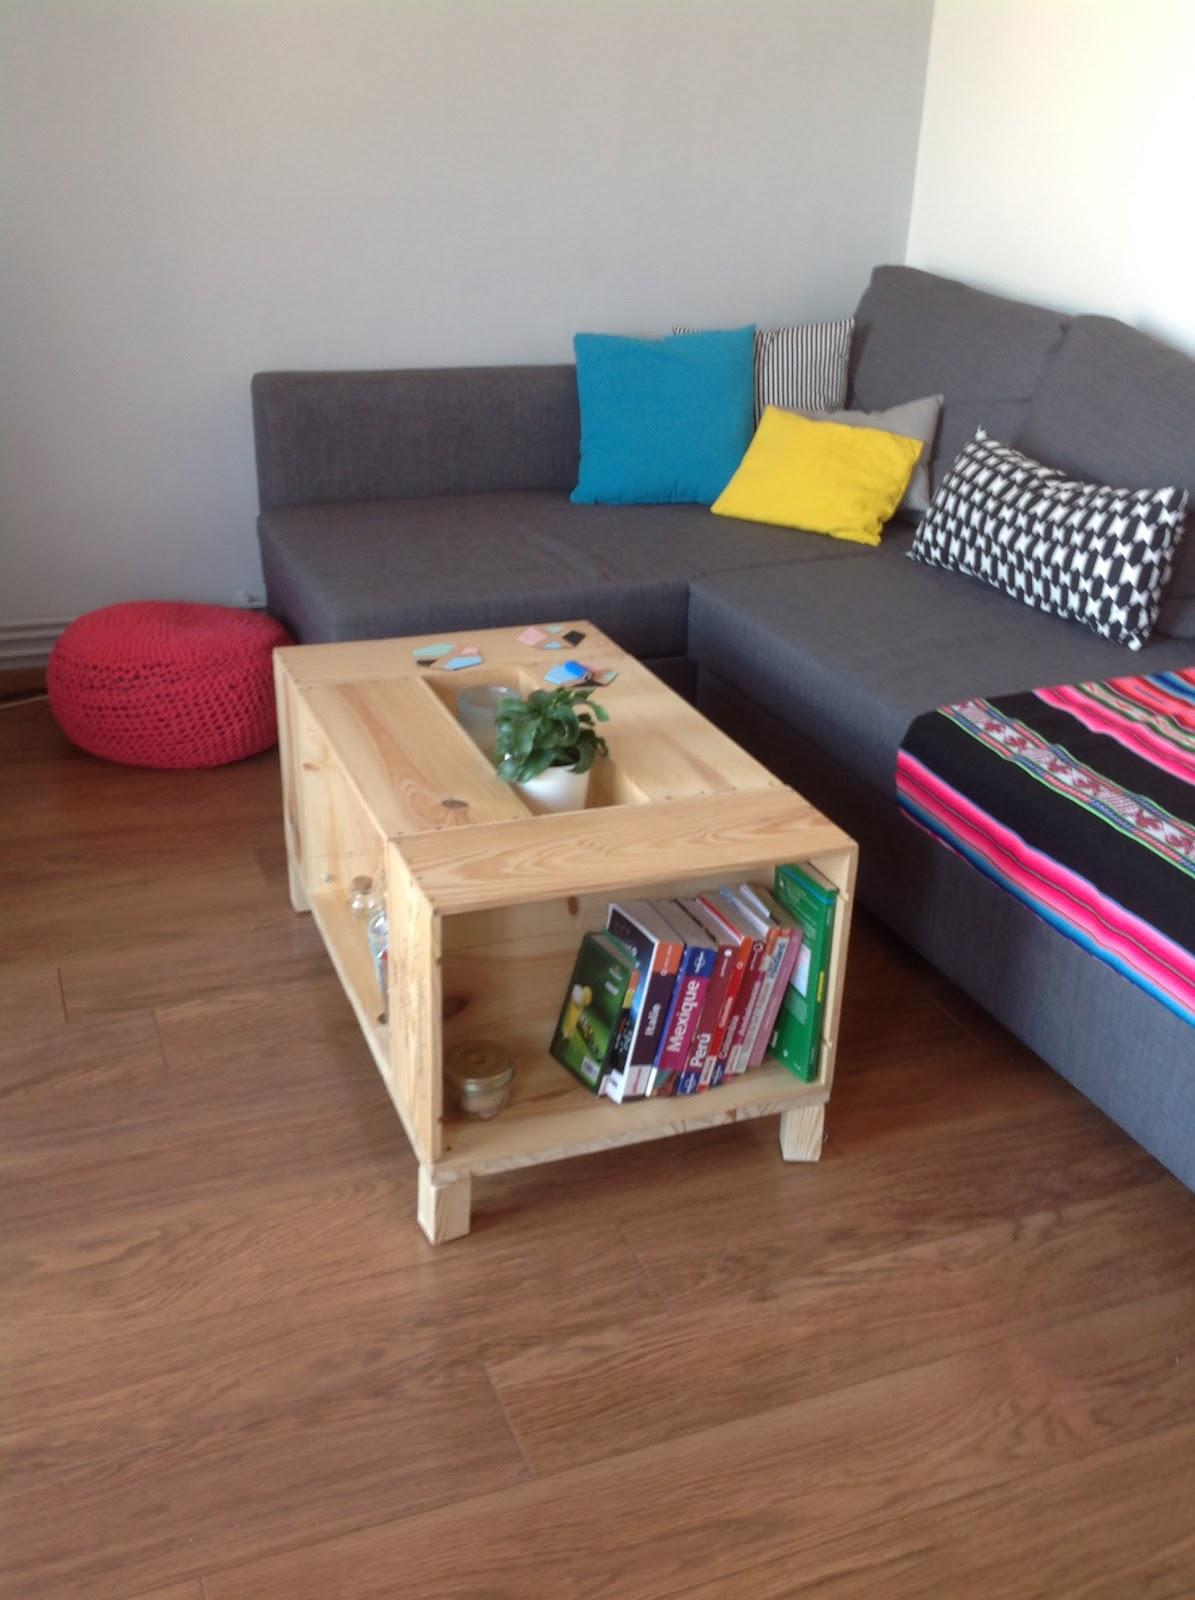 la rosa rose caisses vin ou table basse. Black Bedroom Furniture Sets. Home Design Ideas